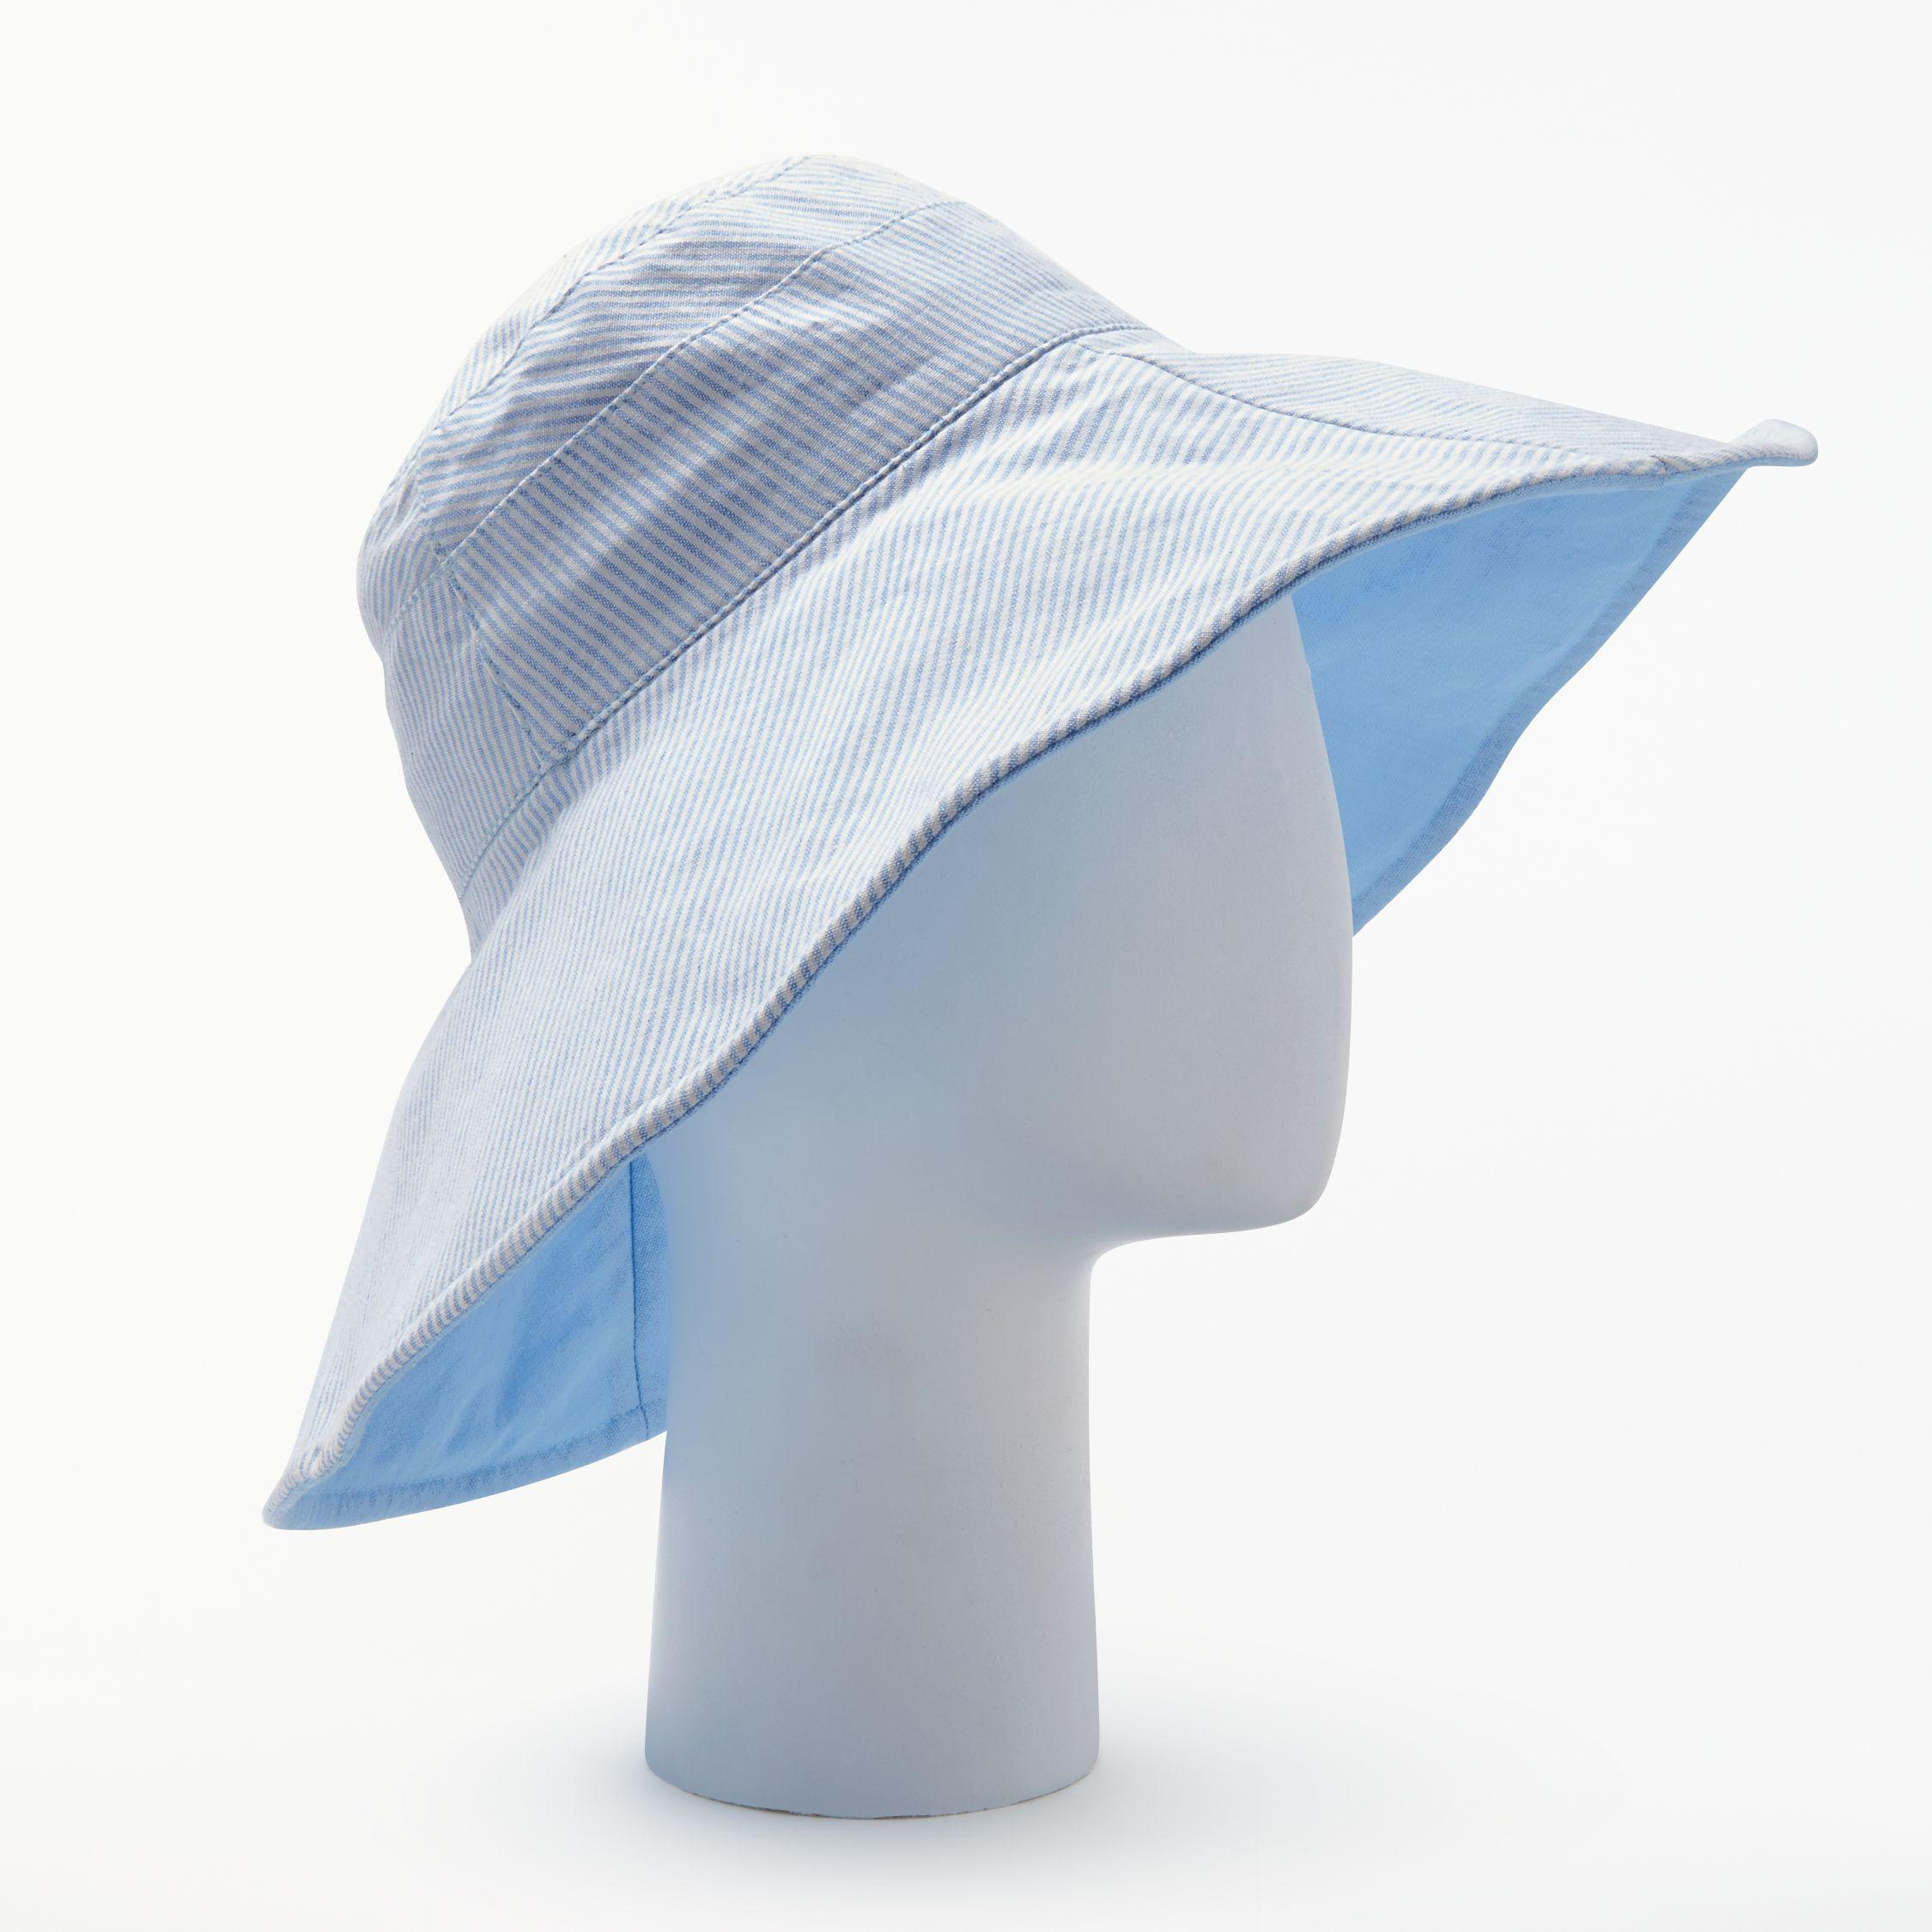 649316e0dfb59 John Lewis Reversible Striped Wide Brim Hat in Blue - Lyst